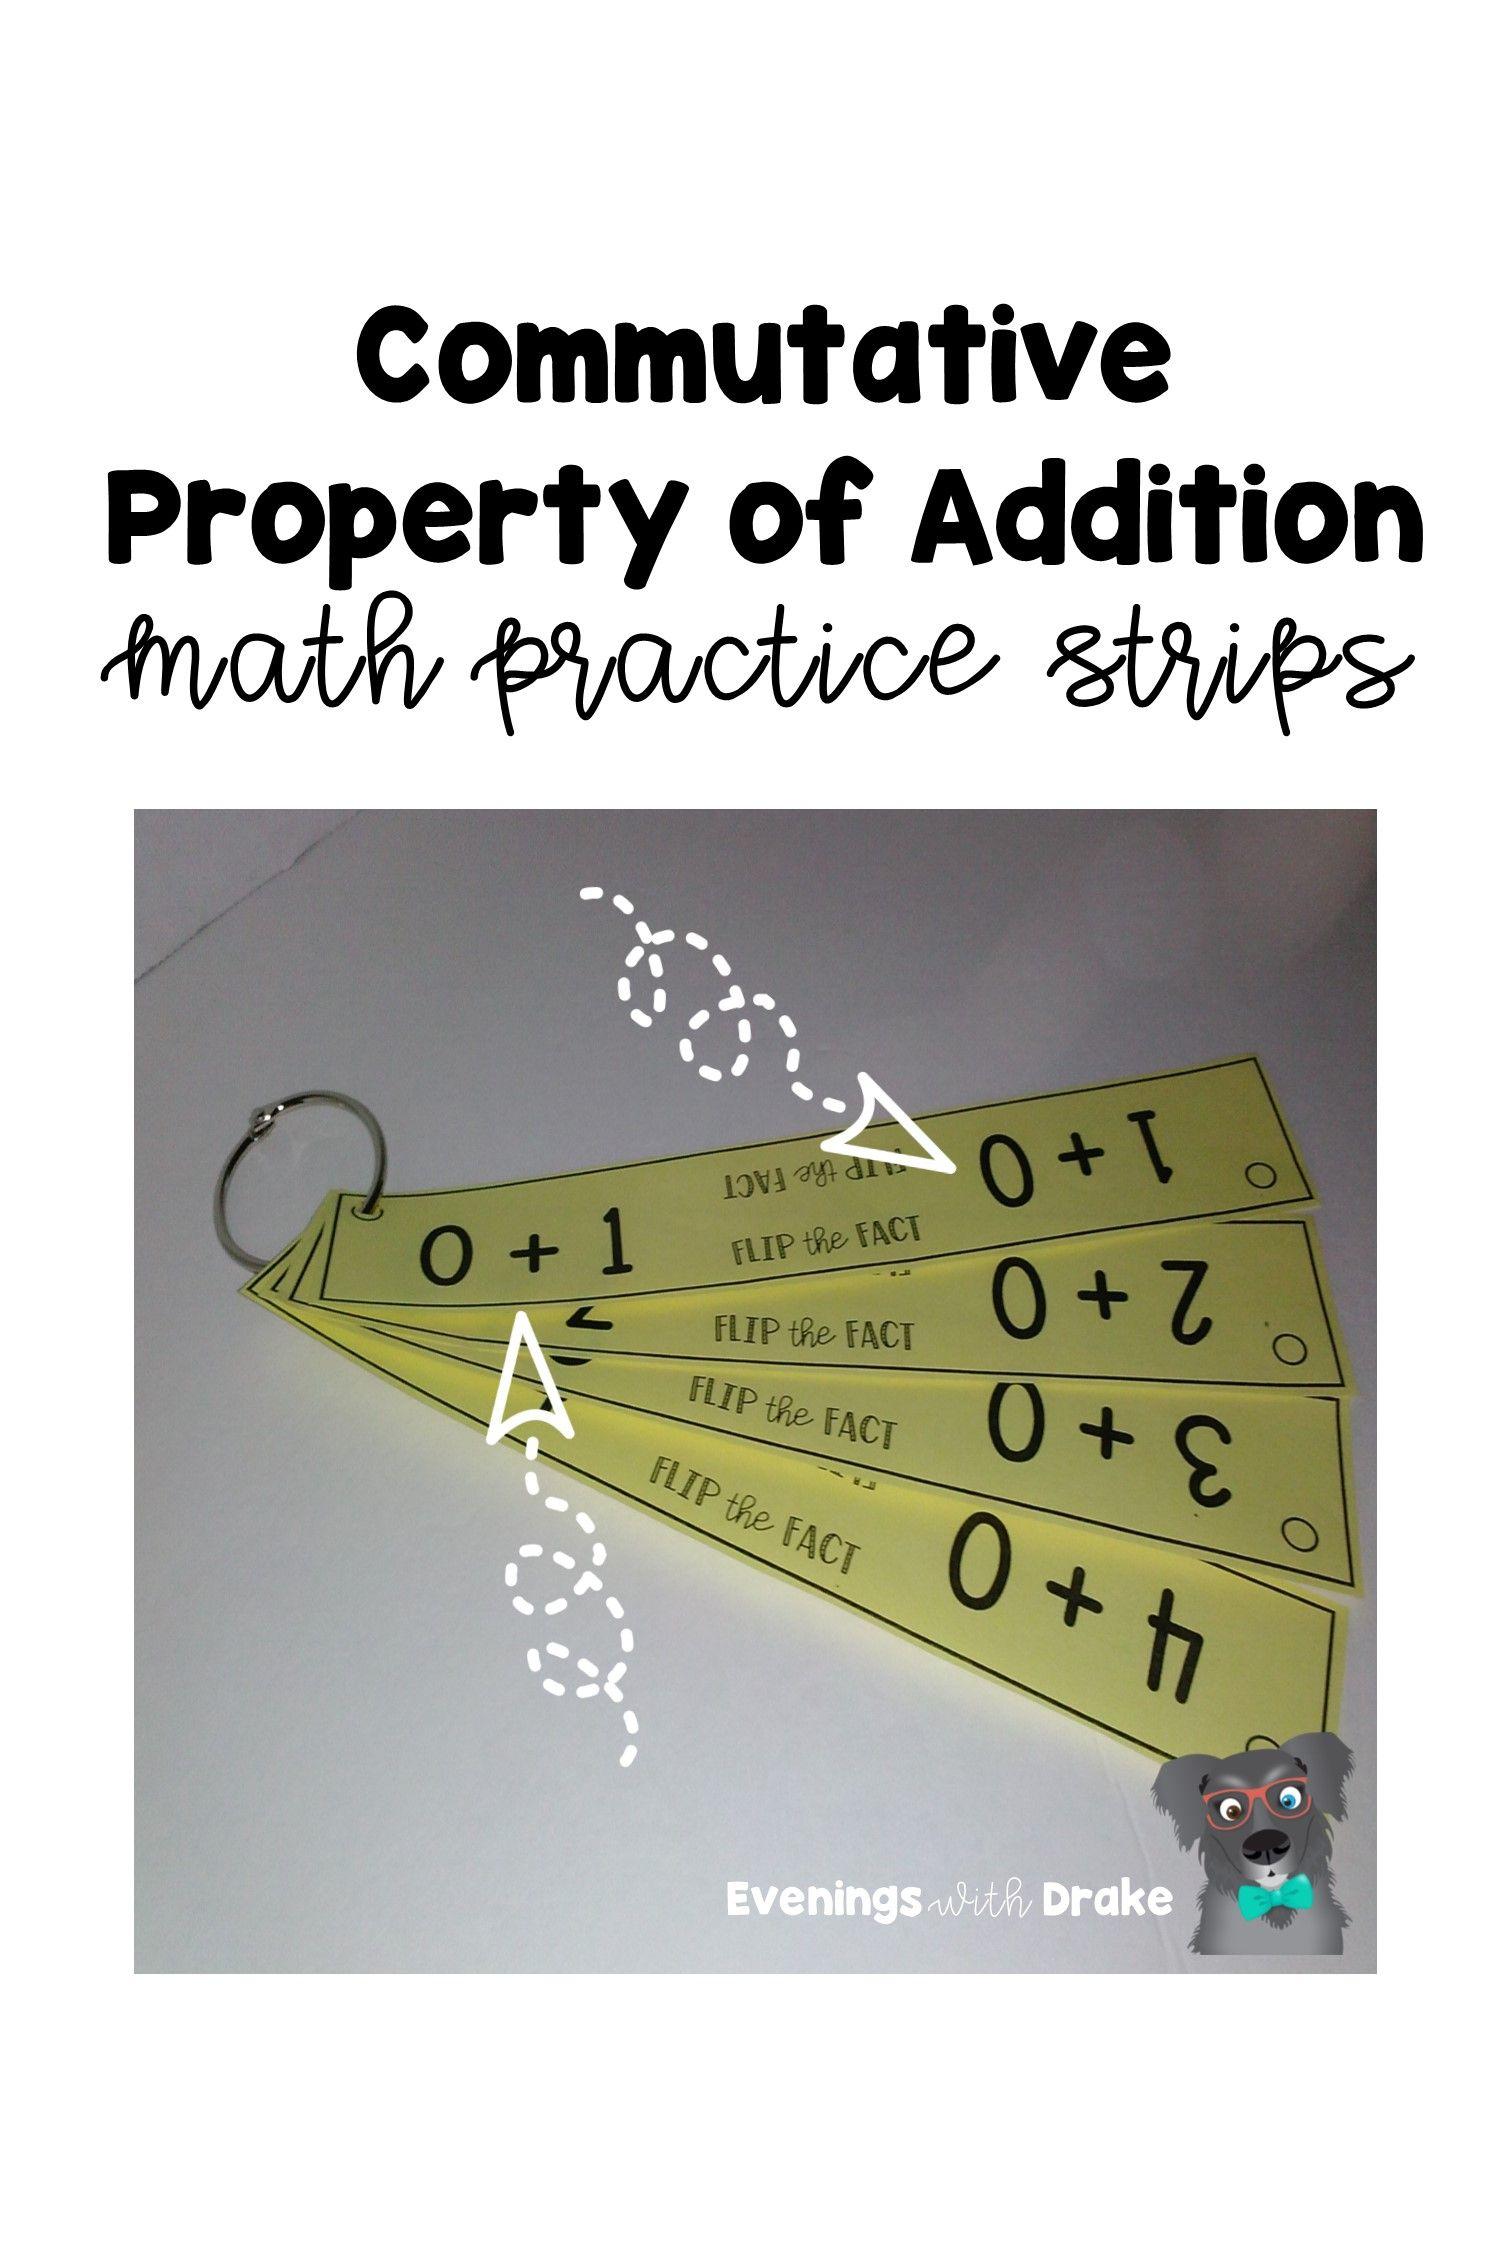 Commutative Property Of Addition Math Strips